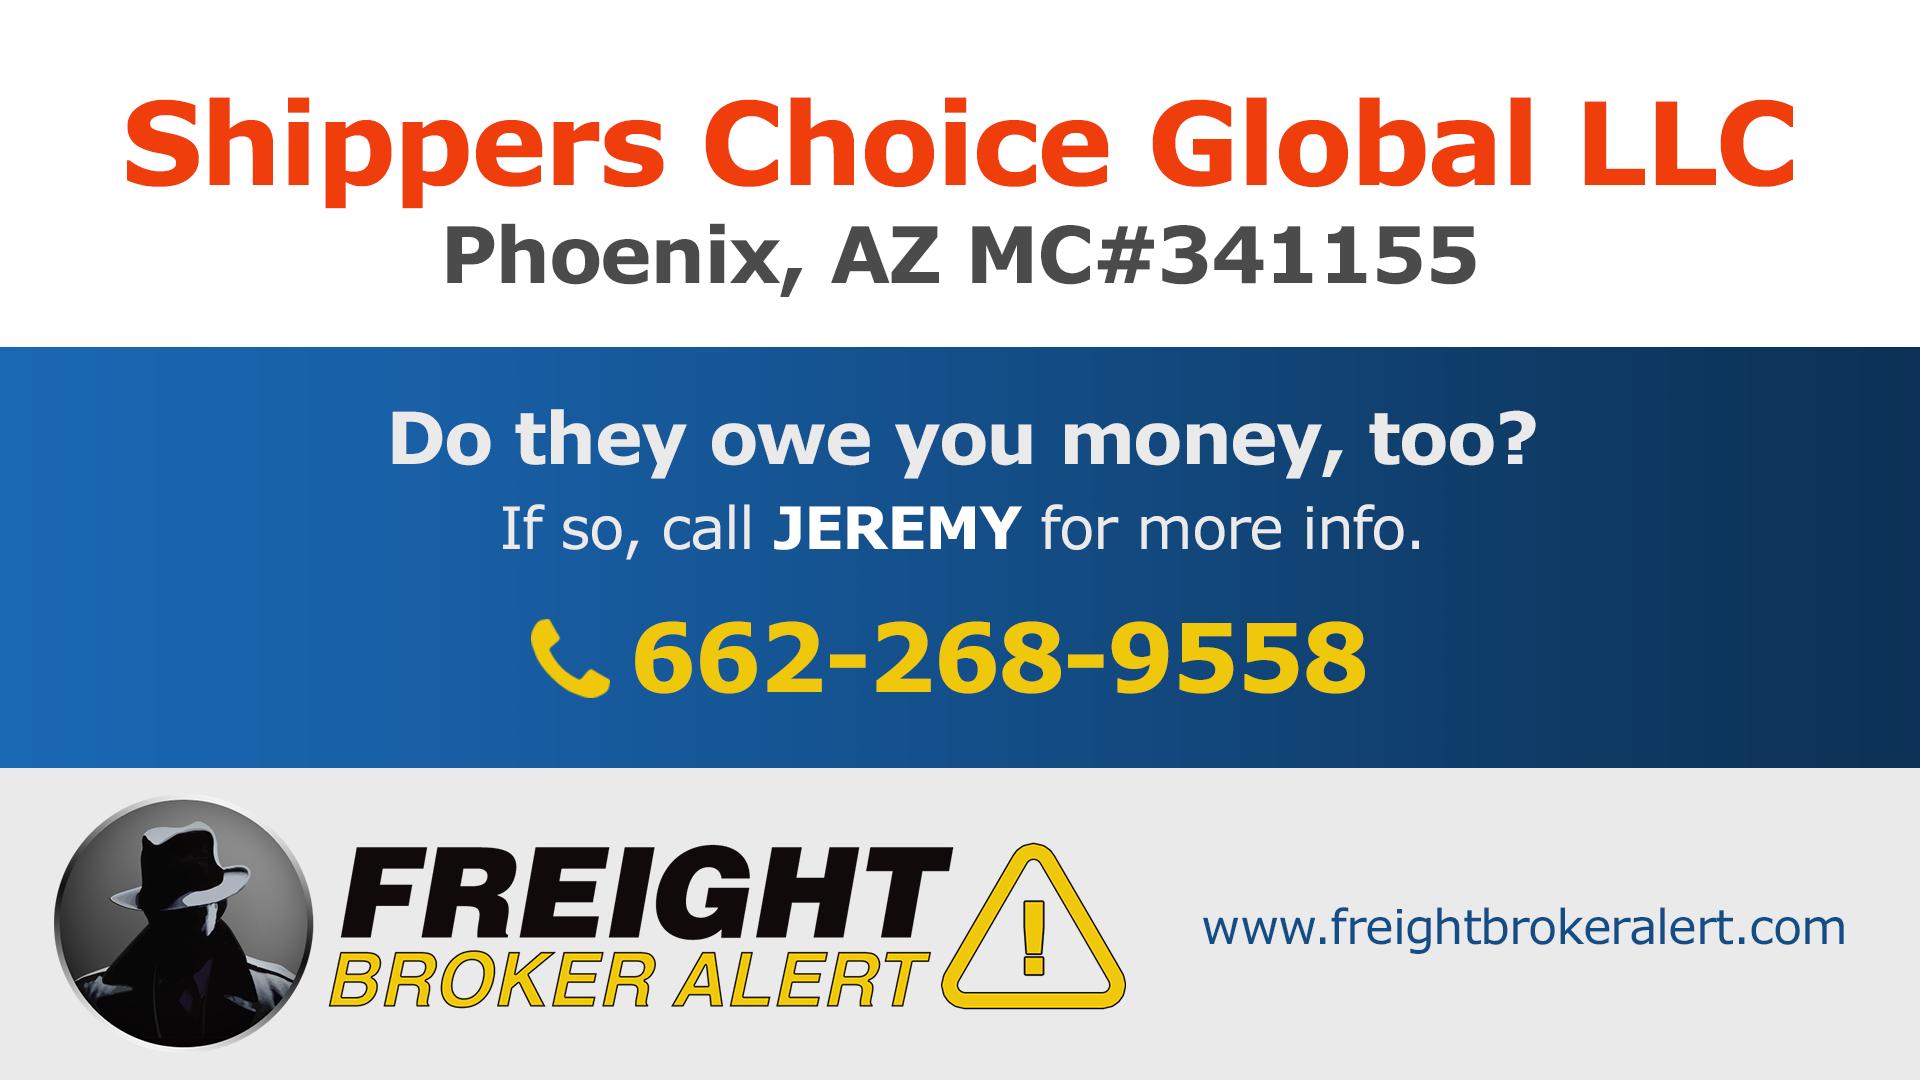 Shippers Choice Global LLC Arizona